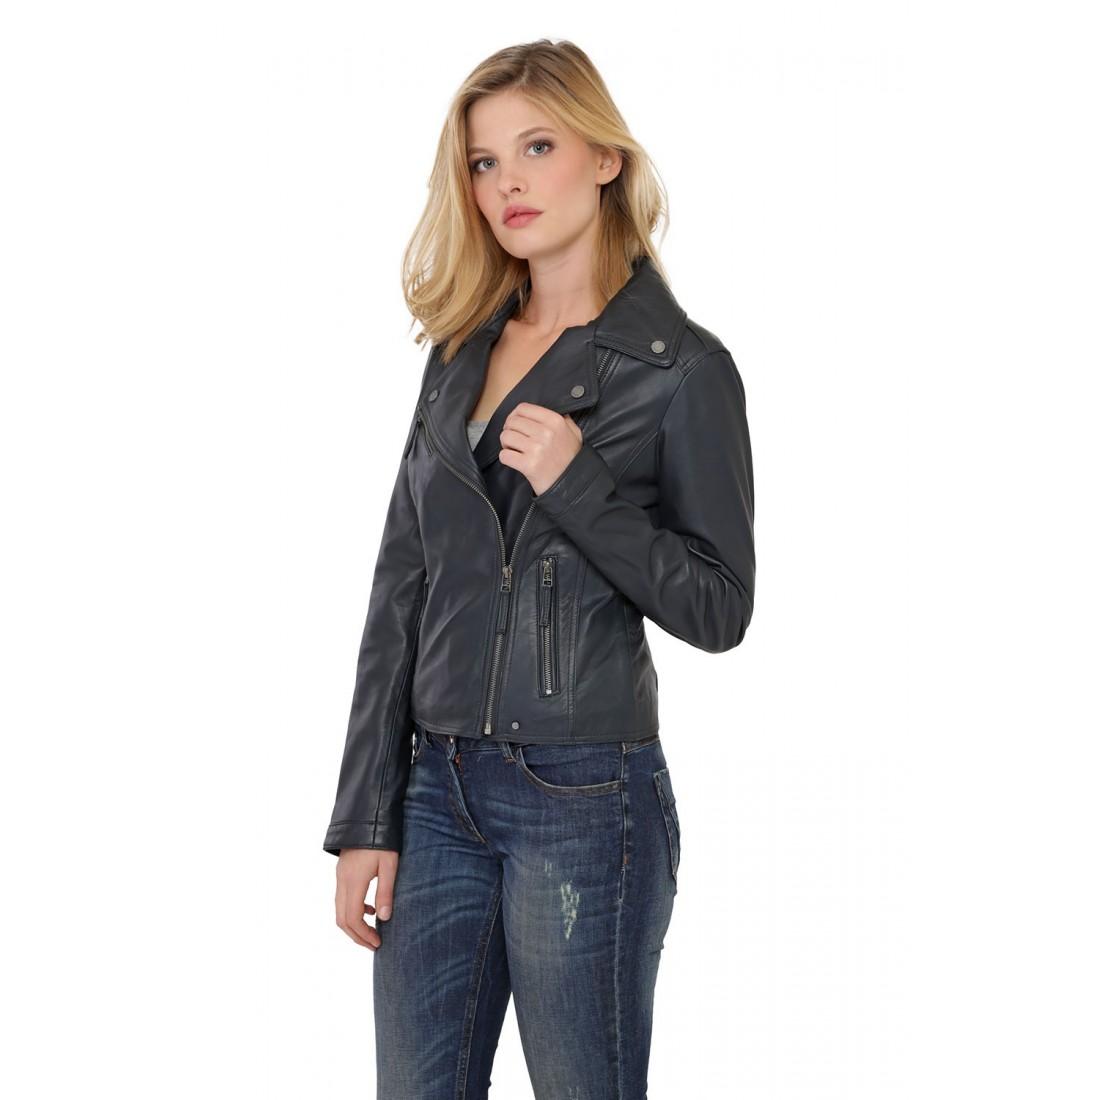 ... Blouson cuir Agneau Bleu Femme Oakwood ... 495592cd5110